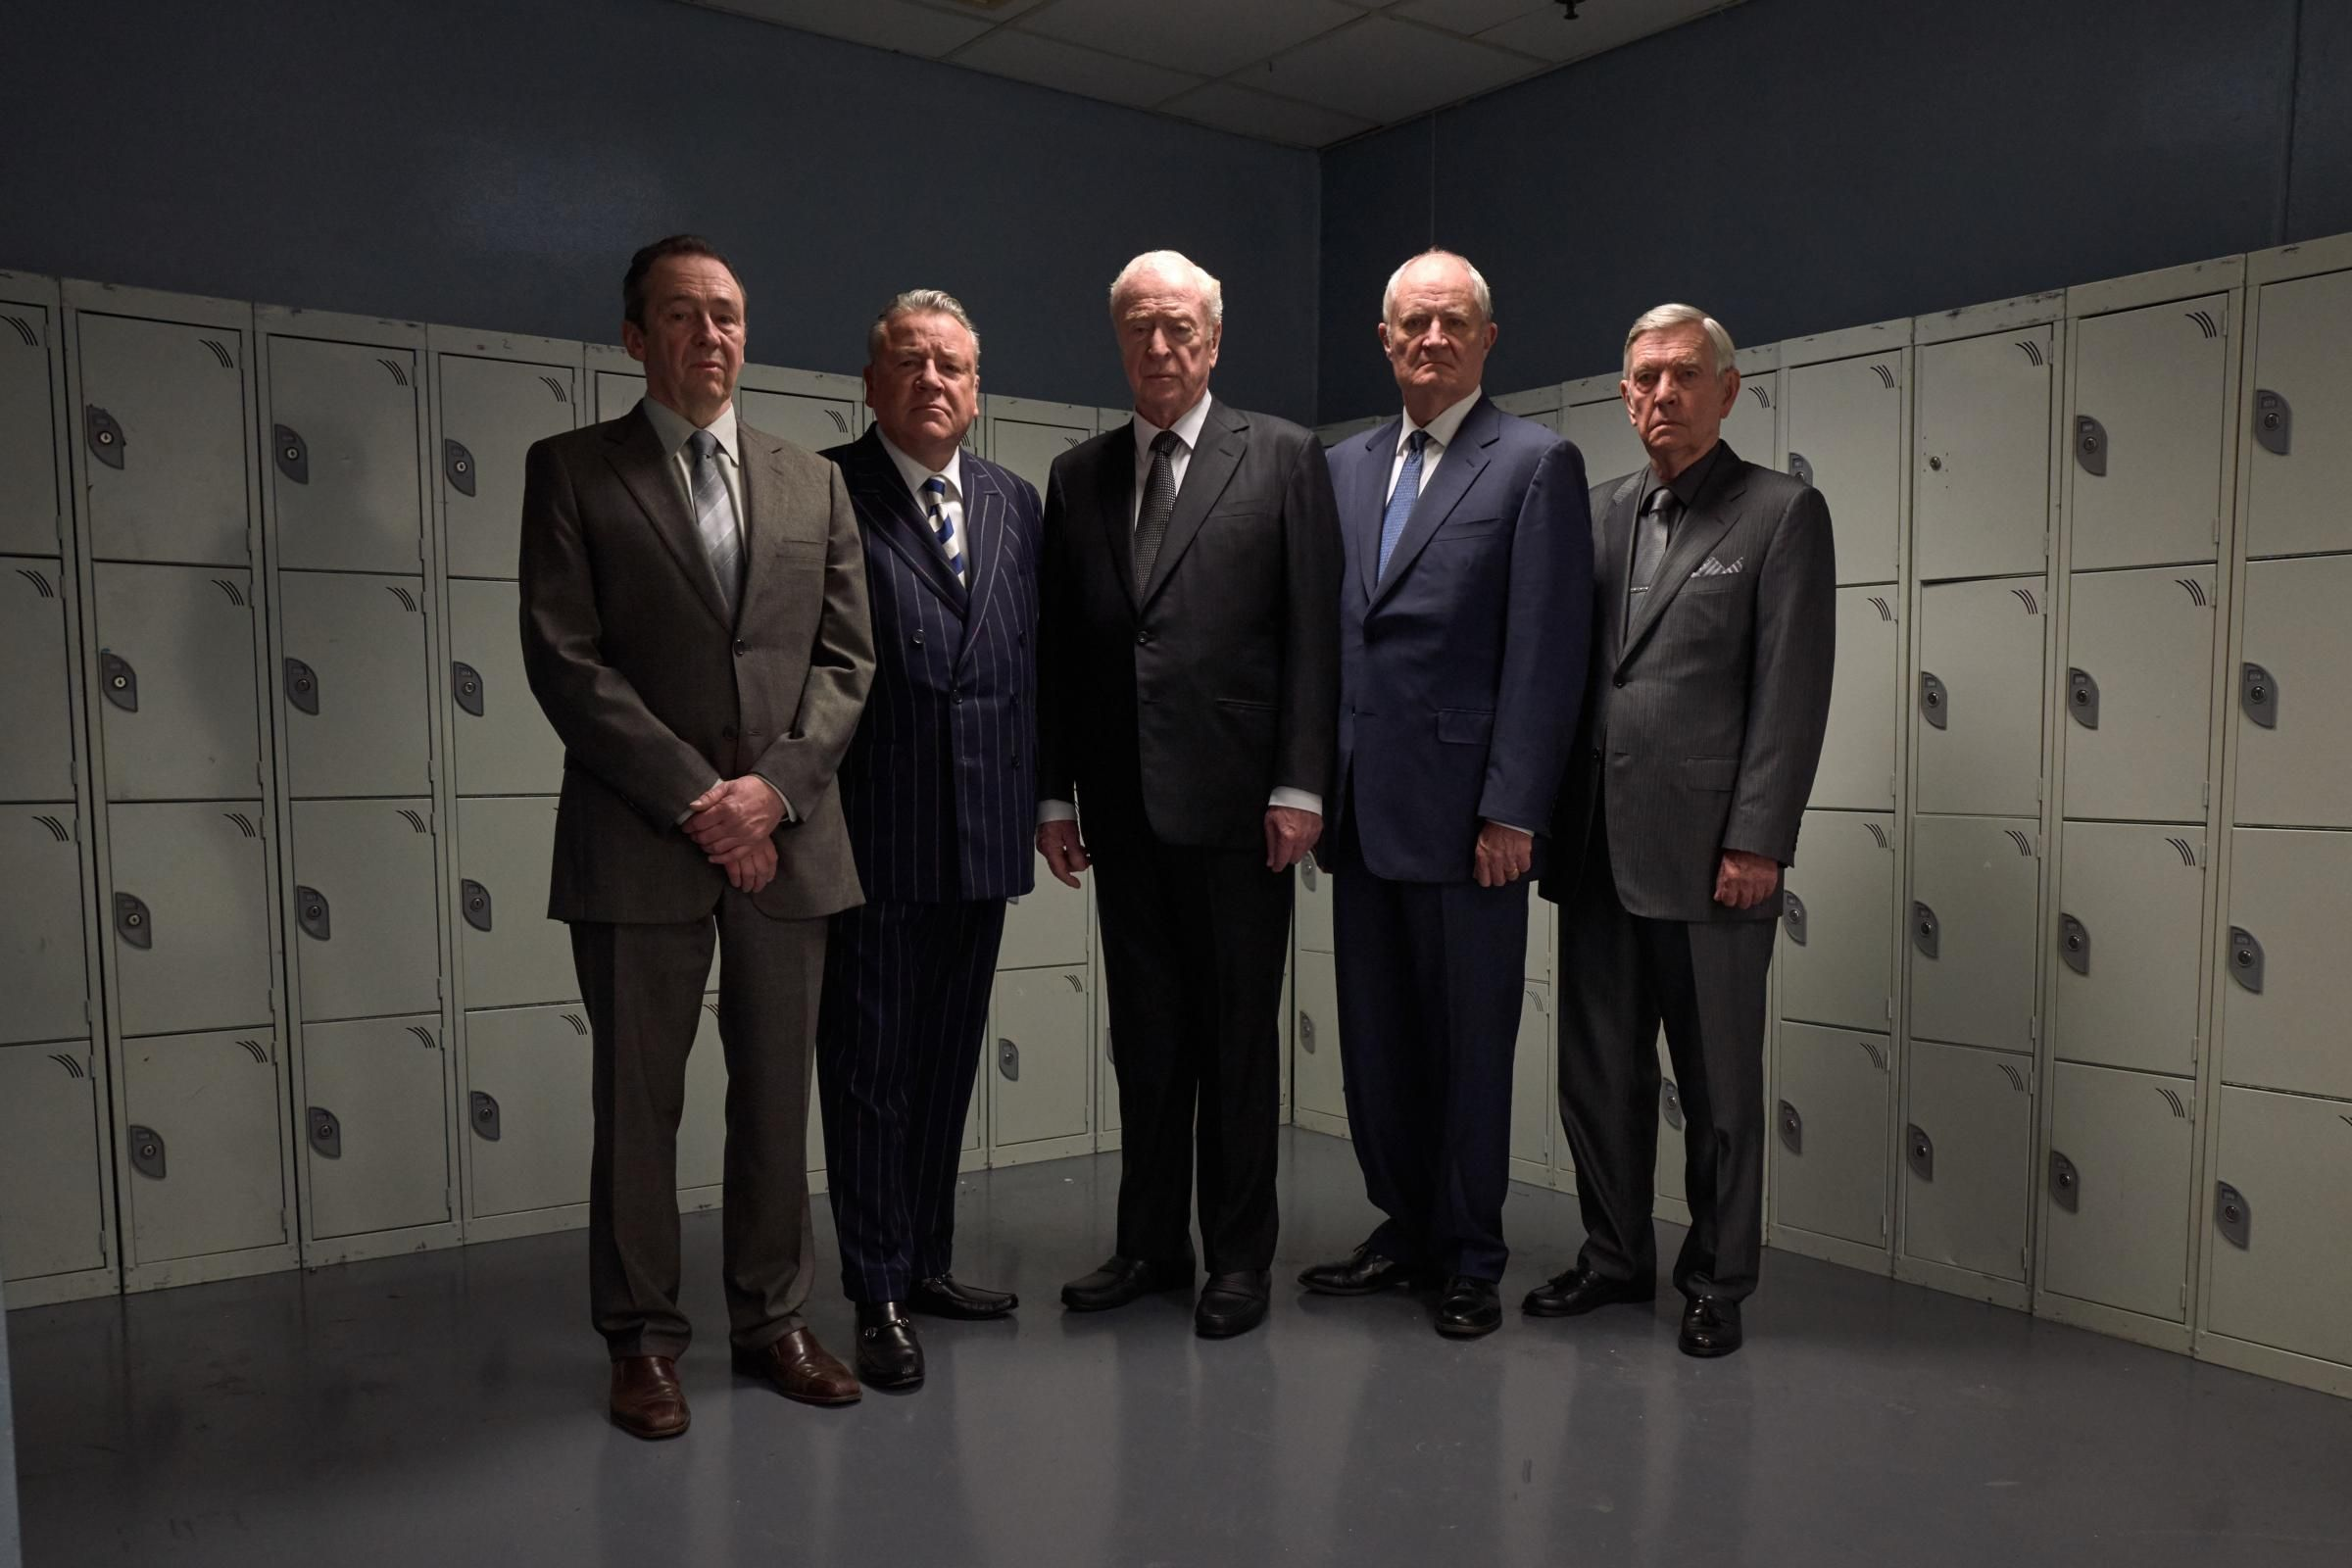 Sir Michael Caine in expletiveladen trailer for Hatton